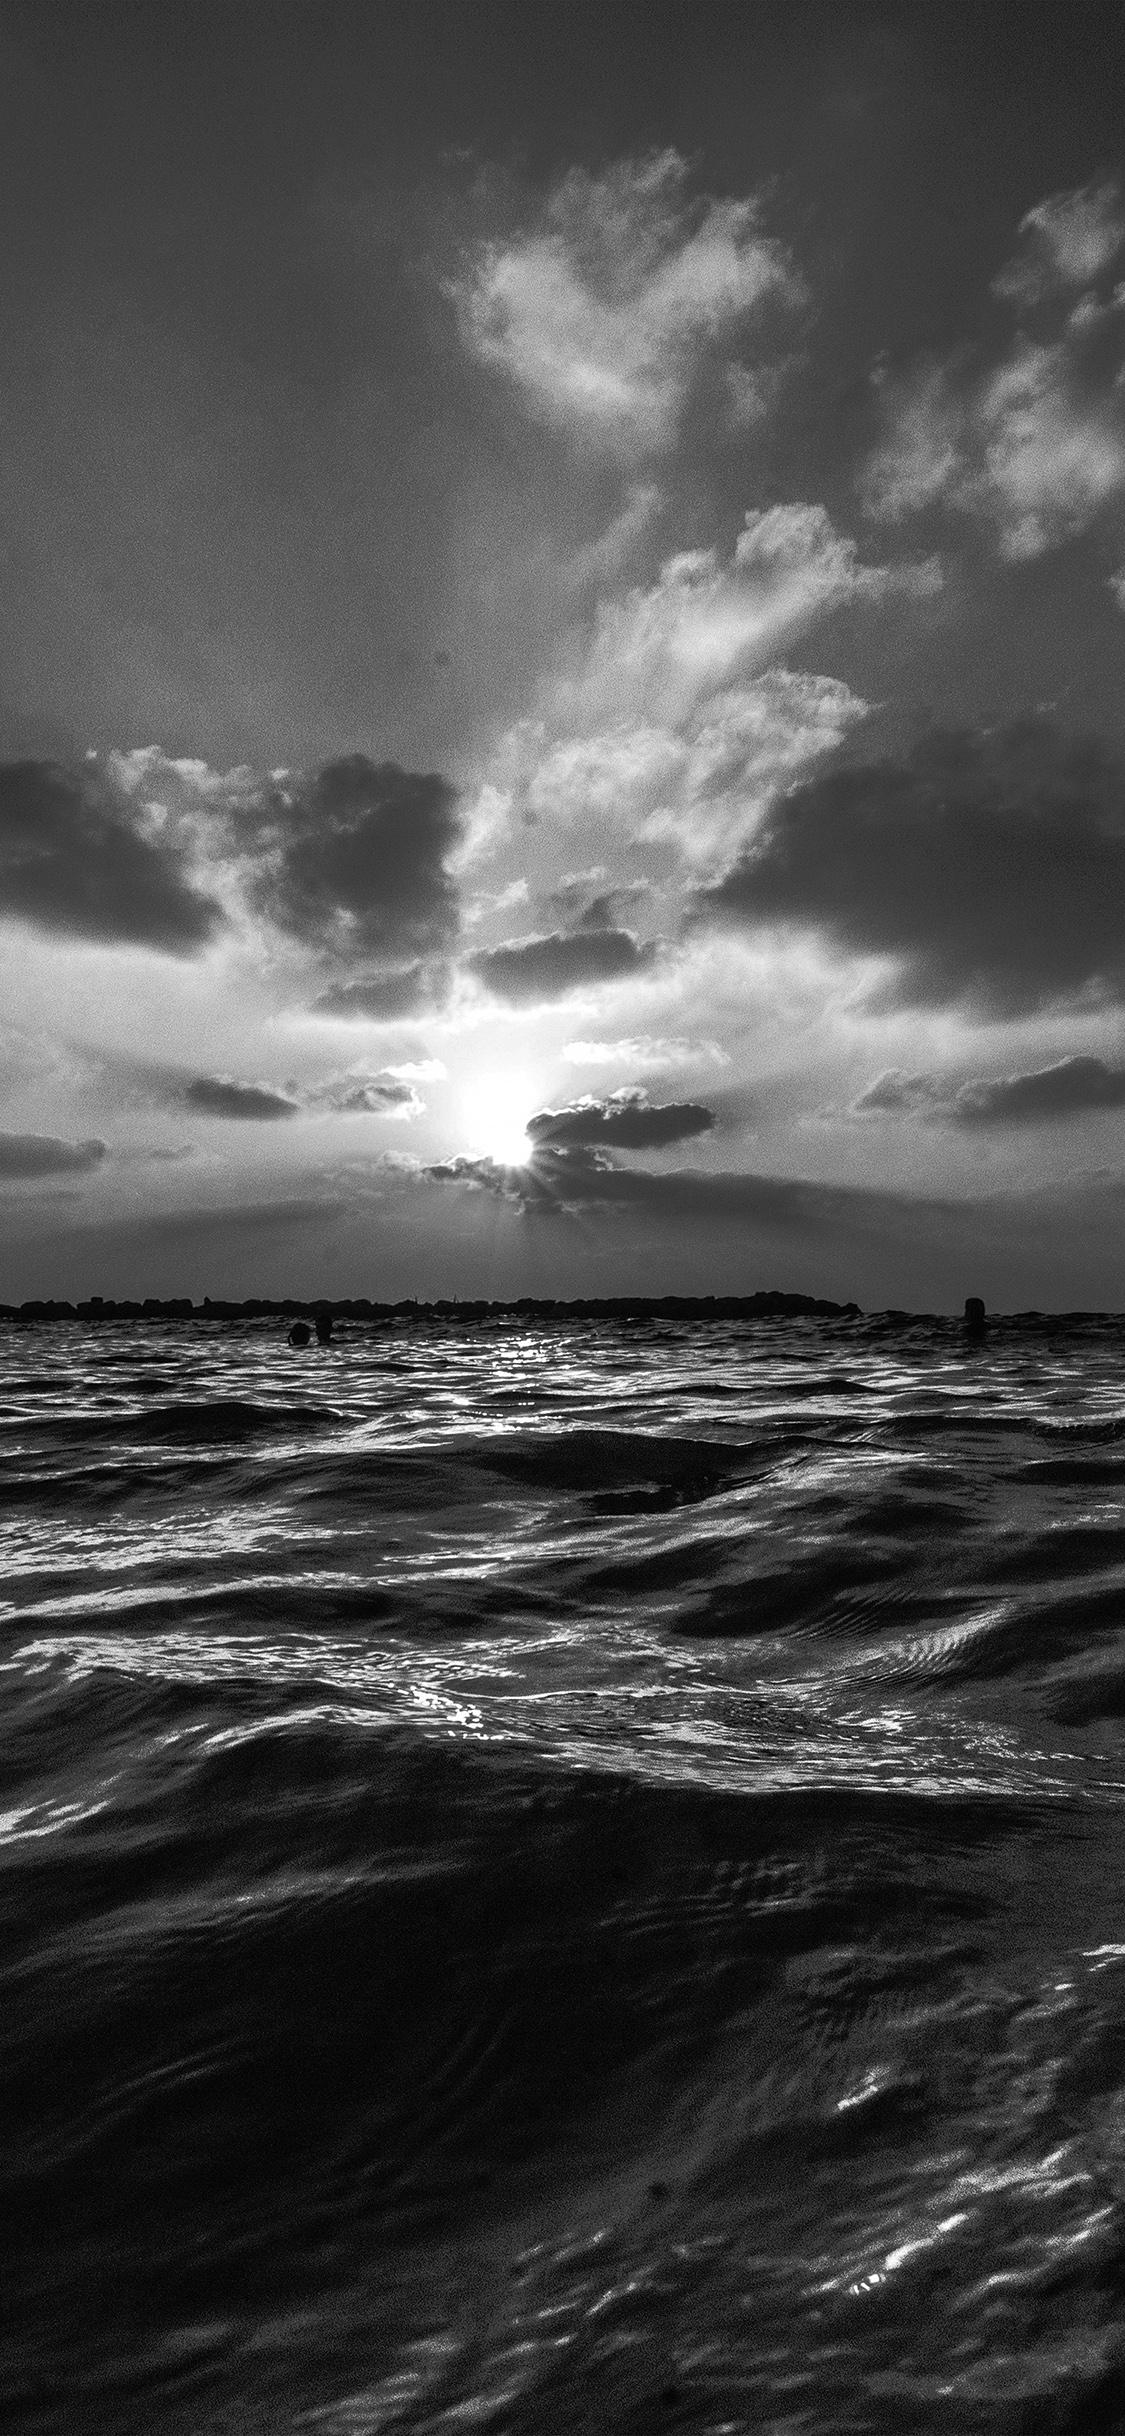 Nf45 Sunset Sea Sky Ocean Summer Dark Bw Water Nature